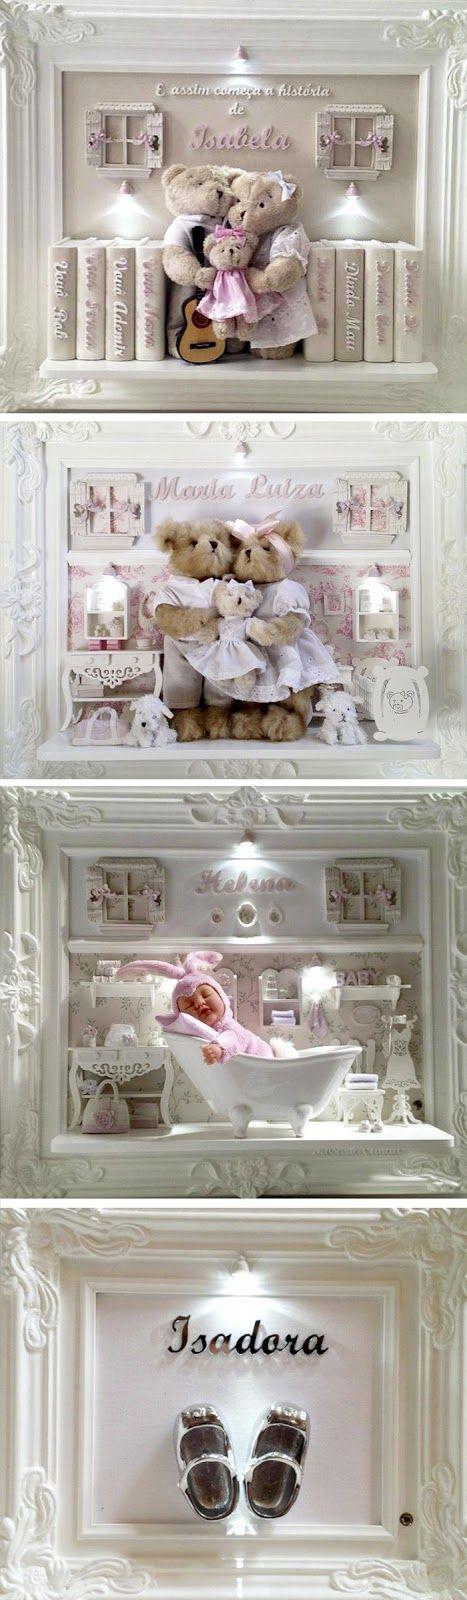 Mexegabula: Boas-vindas: quadros para porta de maternidade